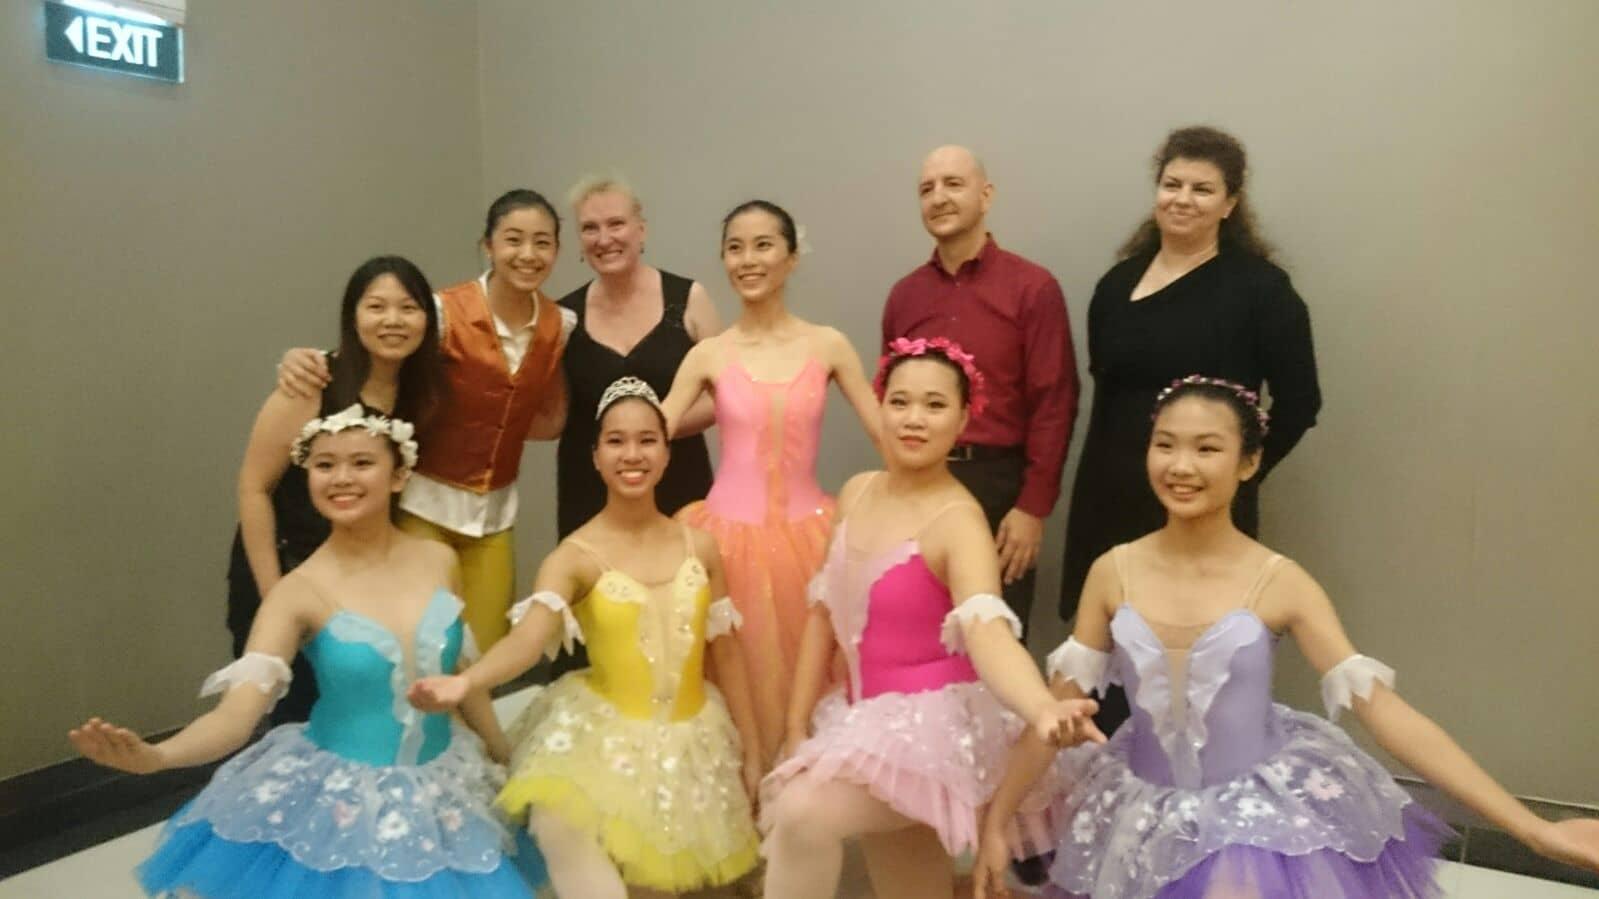 ballet scholarship recipients